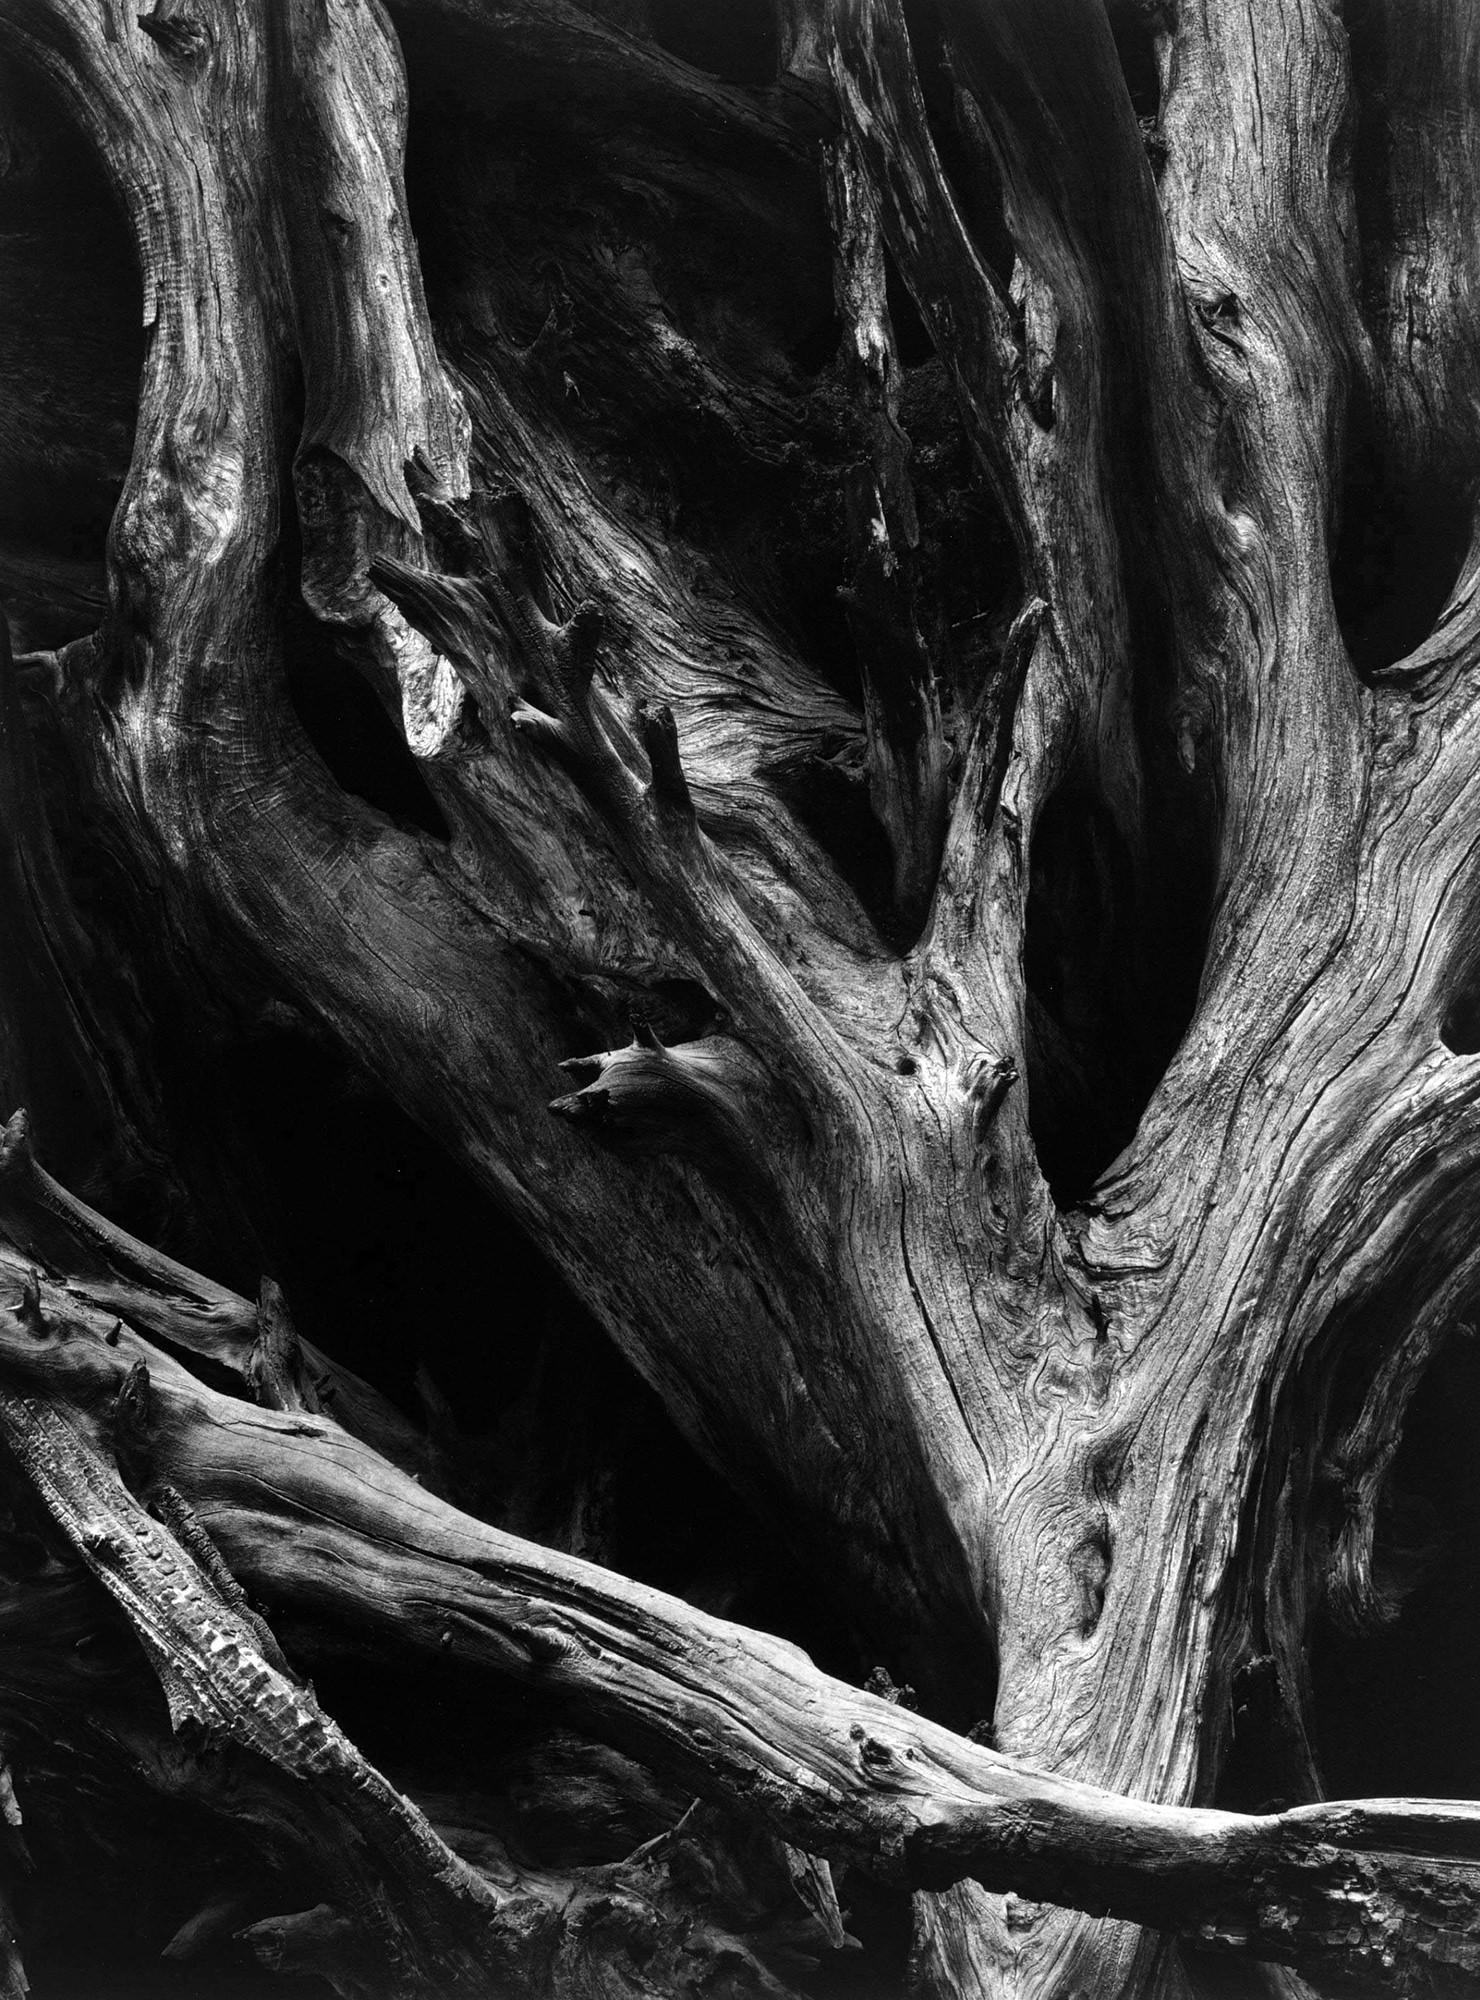 Ansel Adams Sequoia Gigantea Roots Yosemite National Park California v1950